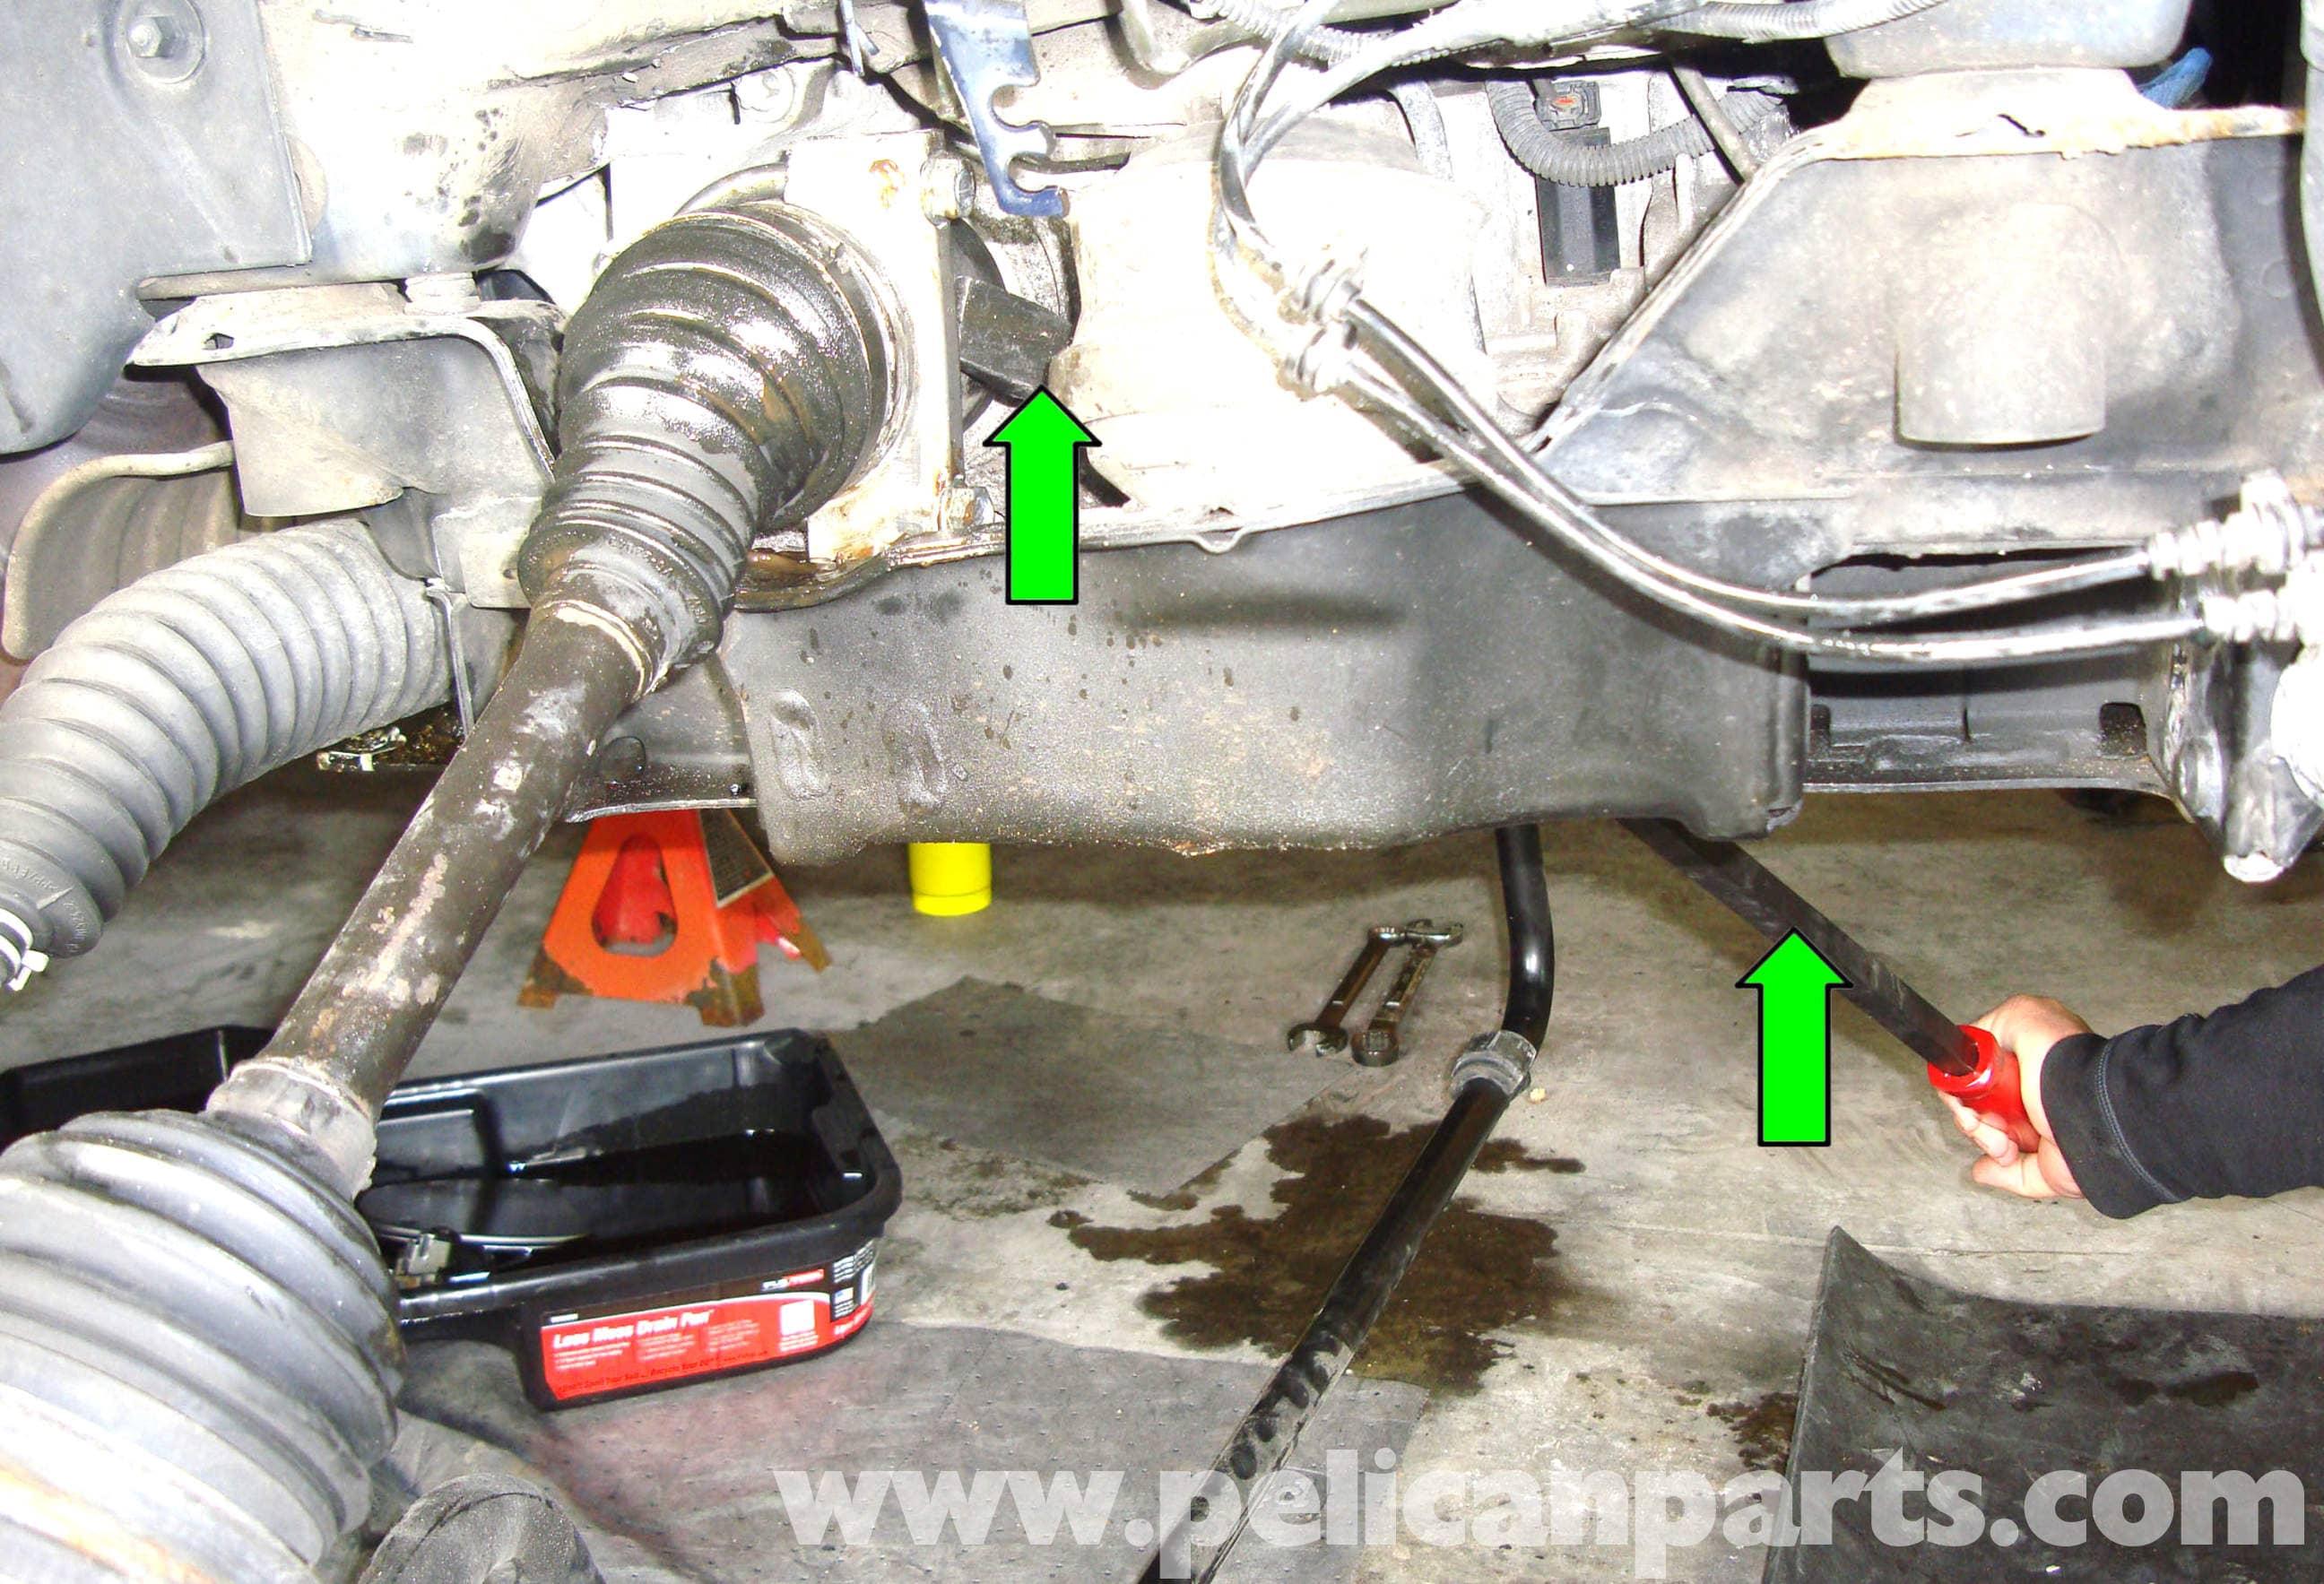 Mercedes Benz W211 Front Axle Shaft Replacement 2003 2009 E320 E500 E55 Pelican Parts Diy